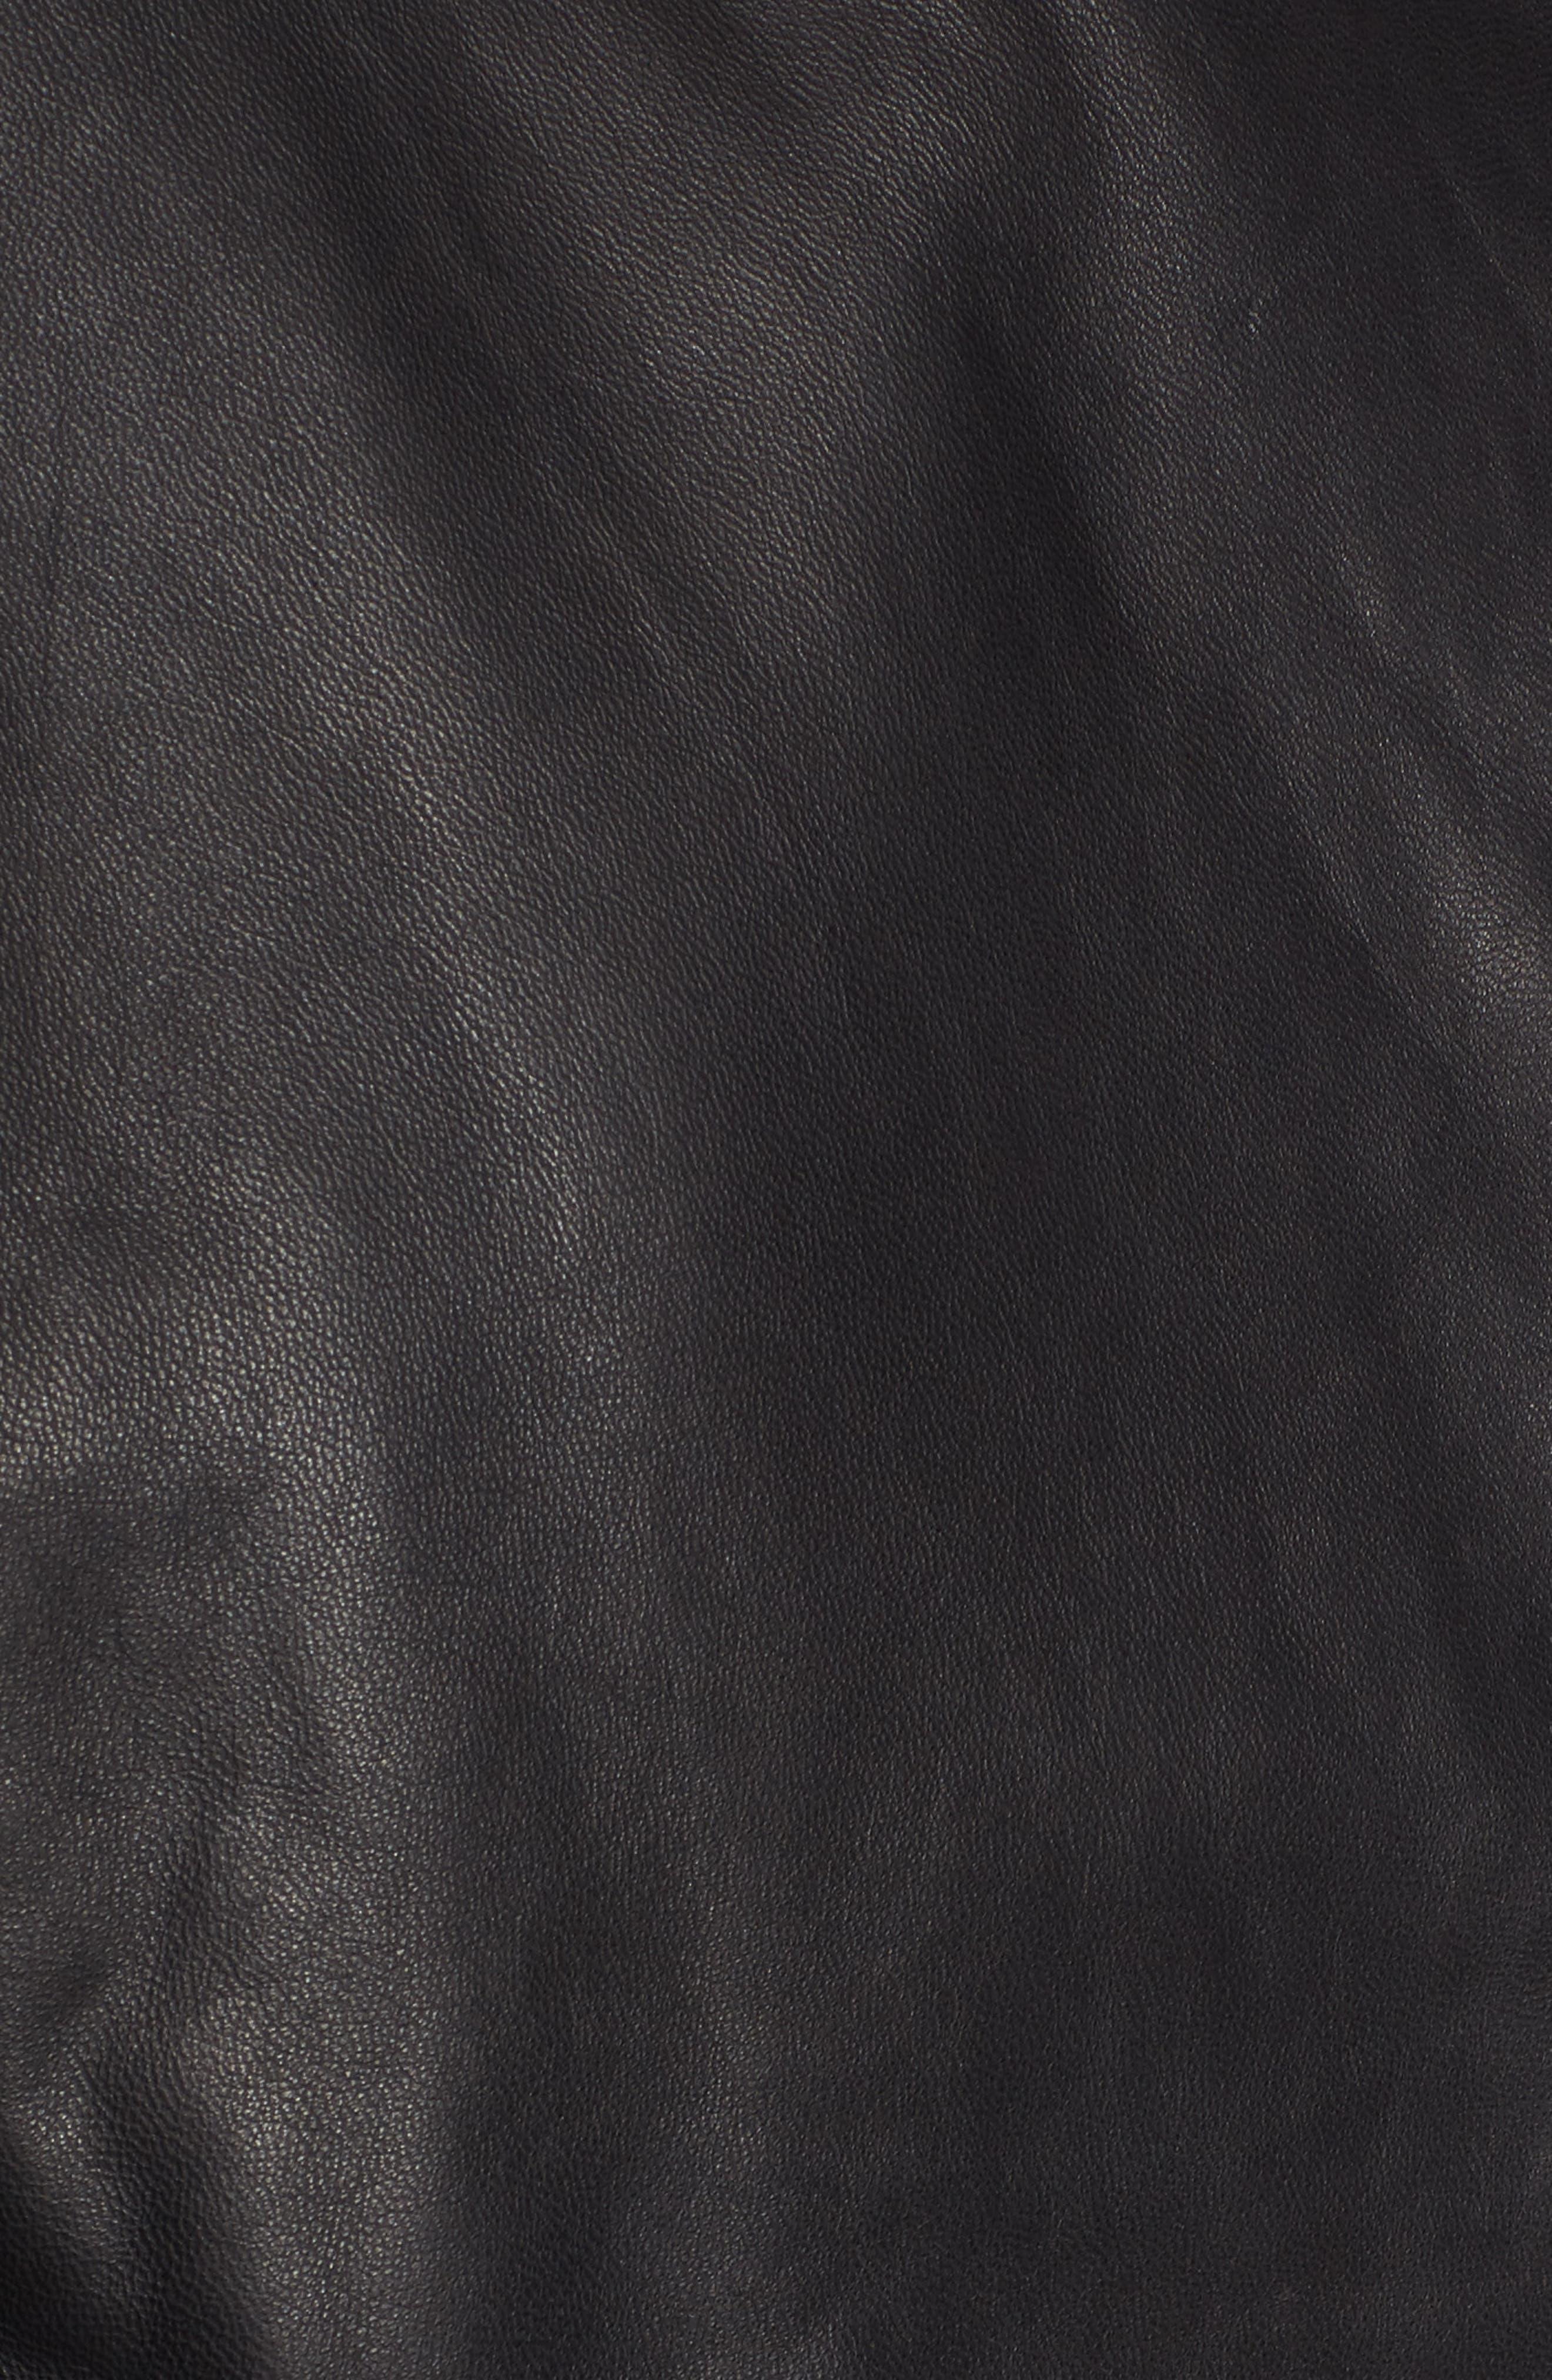 Jetta Asymmetrical Zip Leather Jacket,                             Alternate thumbnail 6, color,                             001